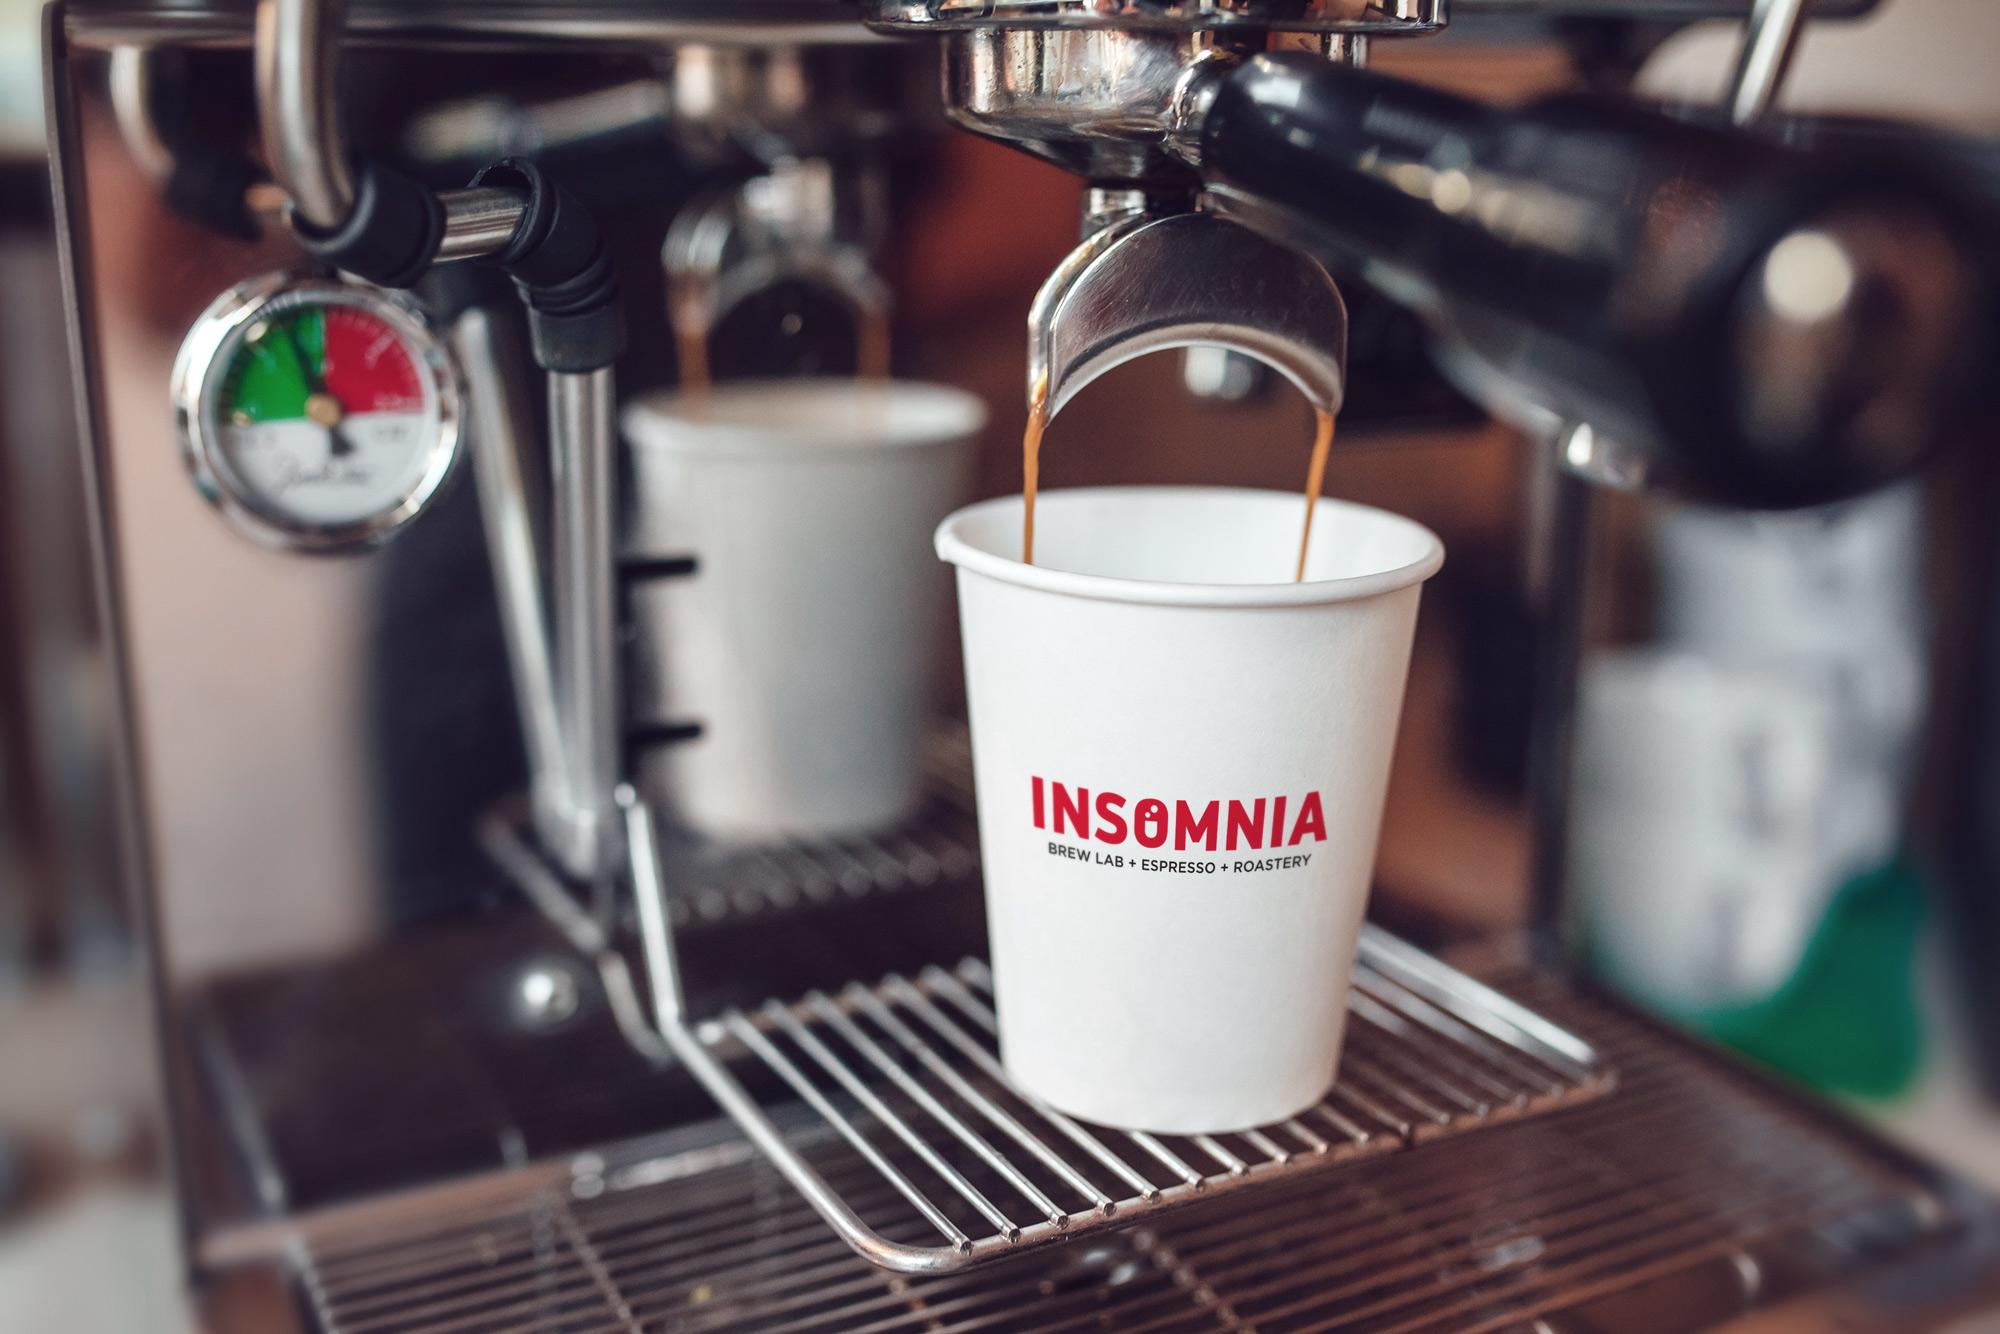 Insomnia Brand